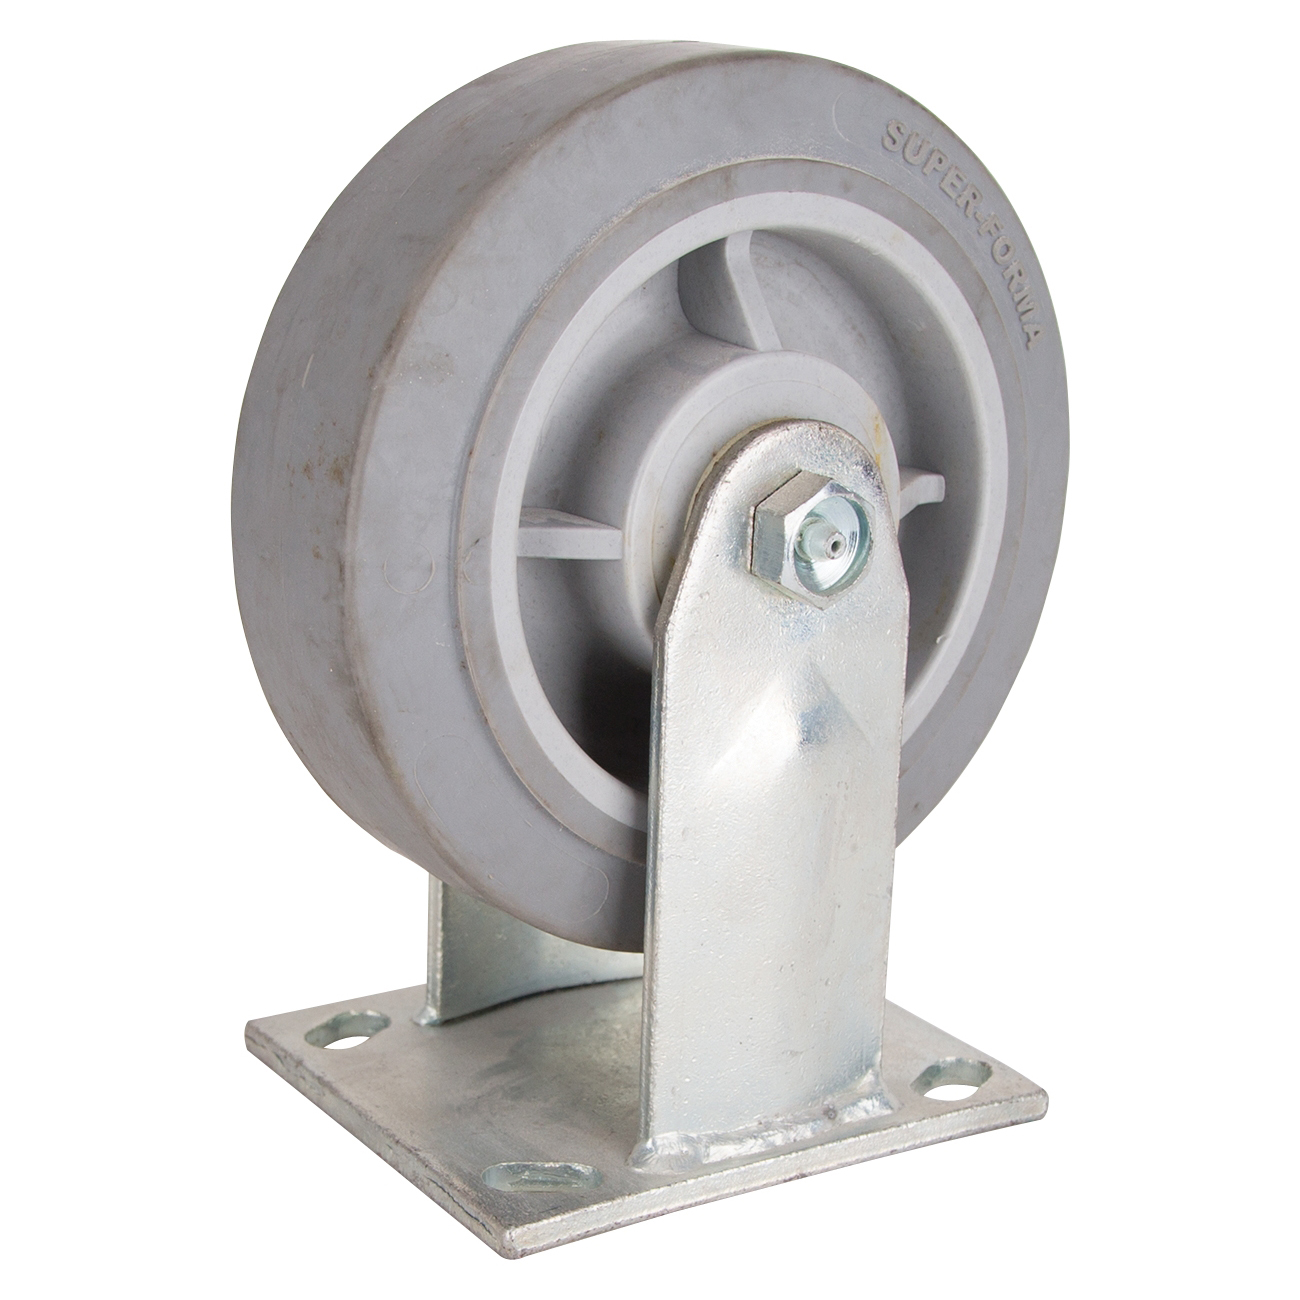 Picture of ProSource JC-T05 Rigid Caster, 6 in Dia Wheel, 2 in W Wheel, Thermoplastic Rubber Wheel, 500 lb